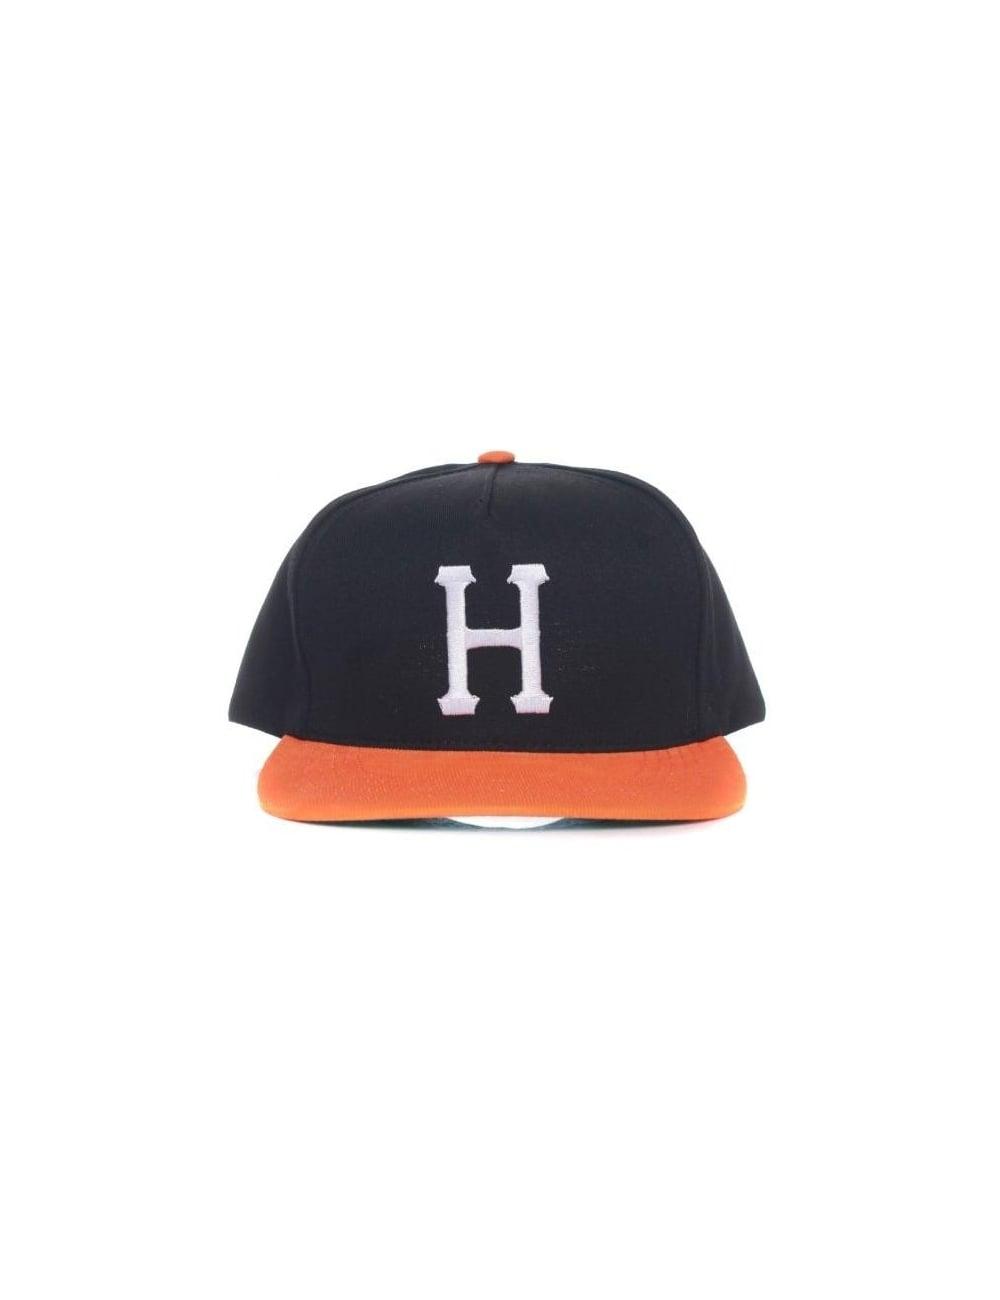 d17927a669b Huf Big H Snapback Hat - Black Orange